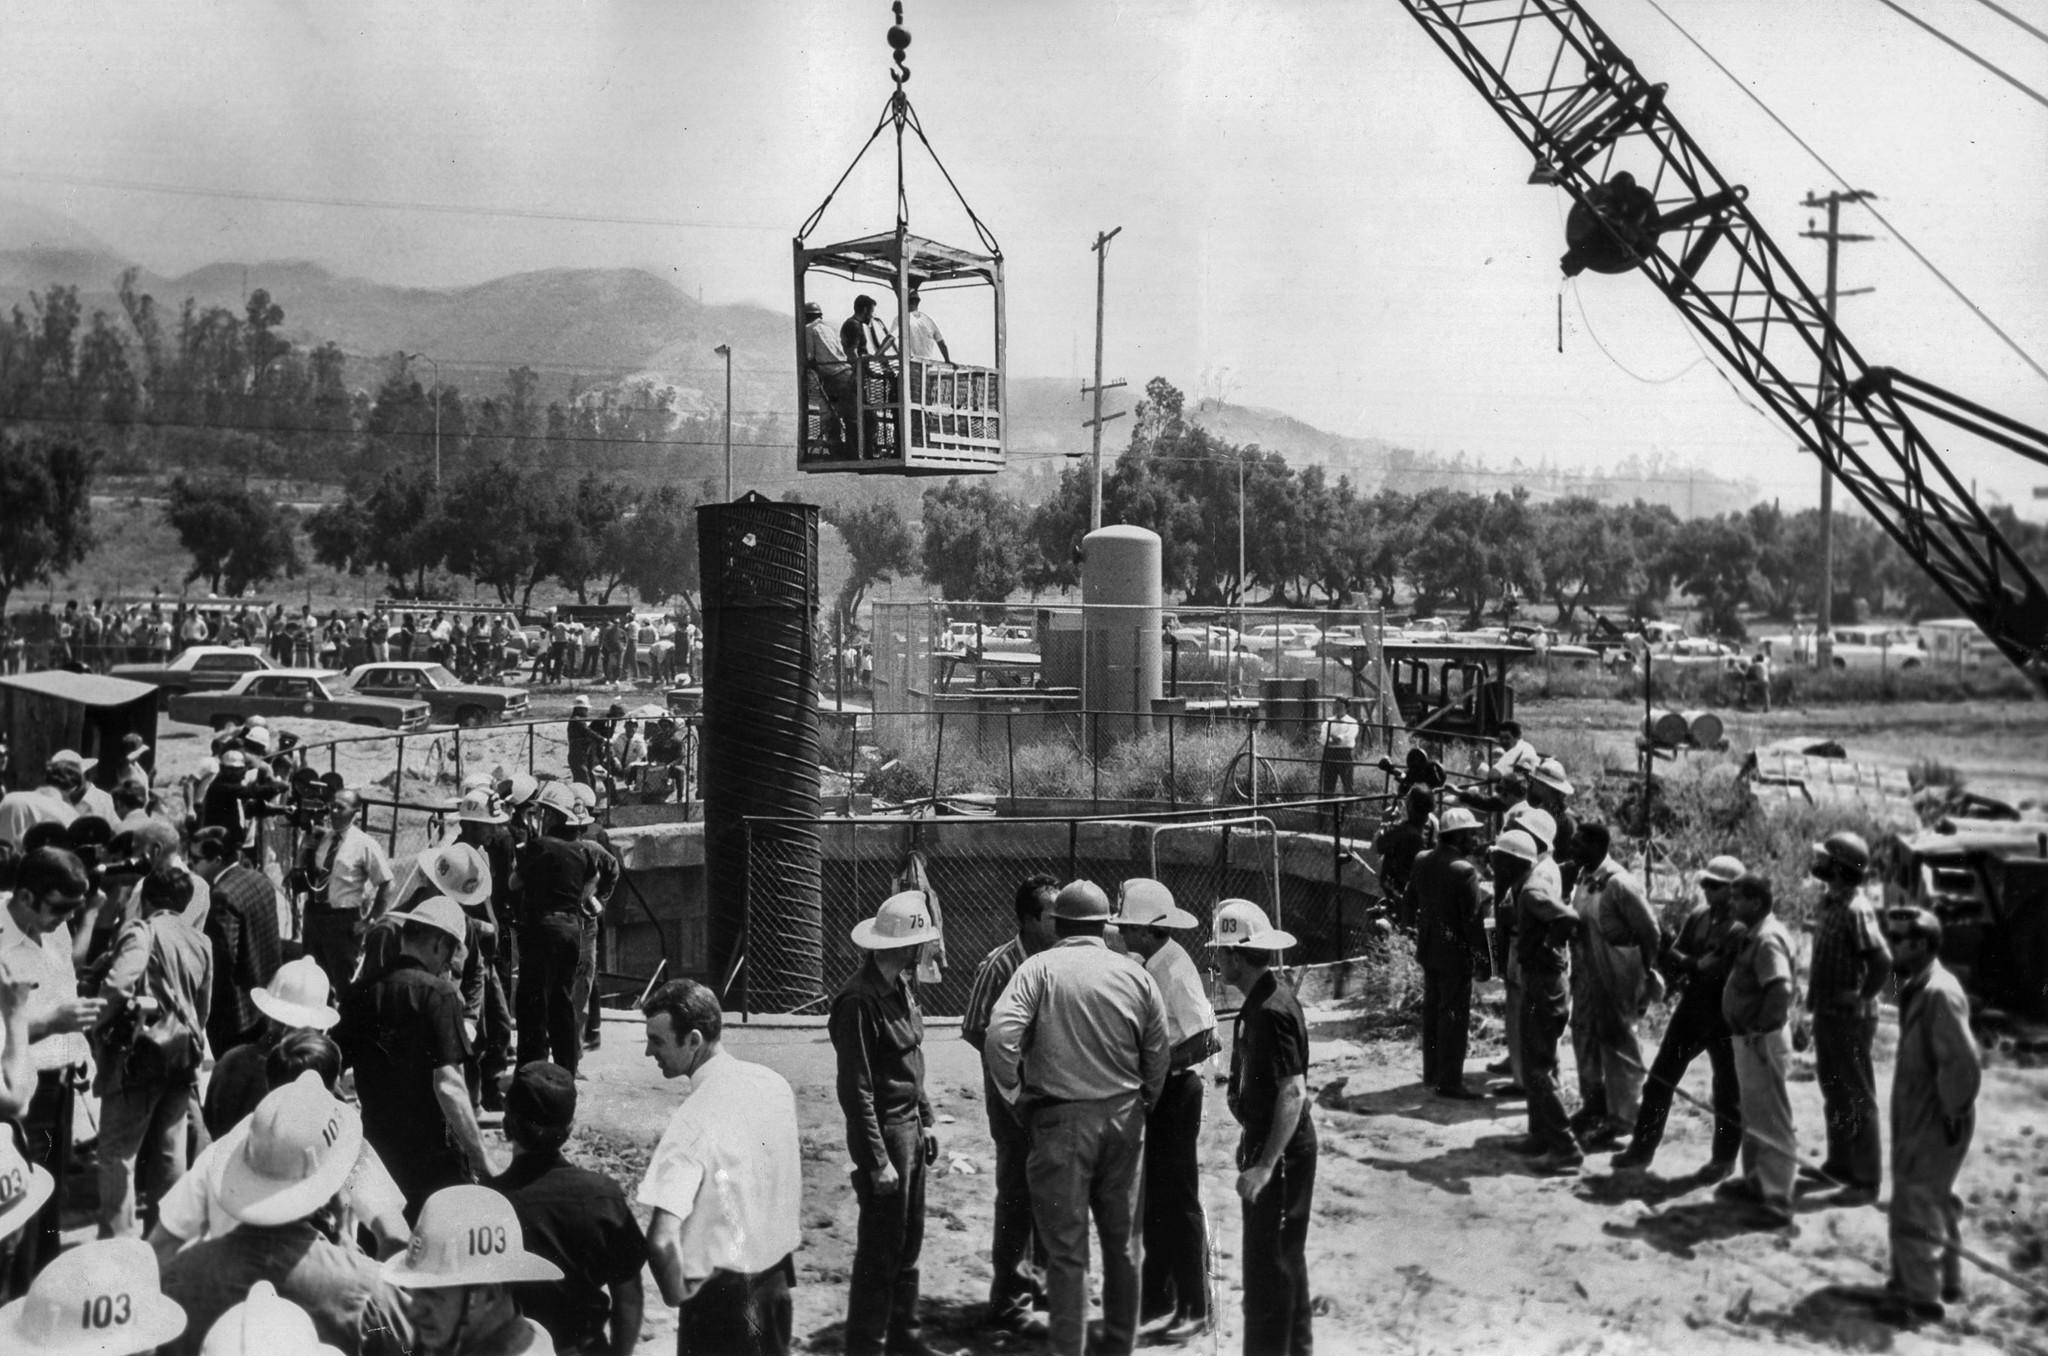 June 24, 1971: Scene at gate shaft on the 5.5 mile long San Fernando tunnel where survivor Ralph Bis